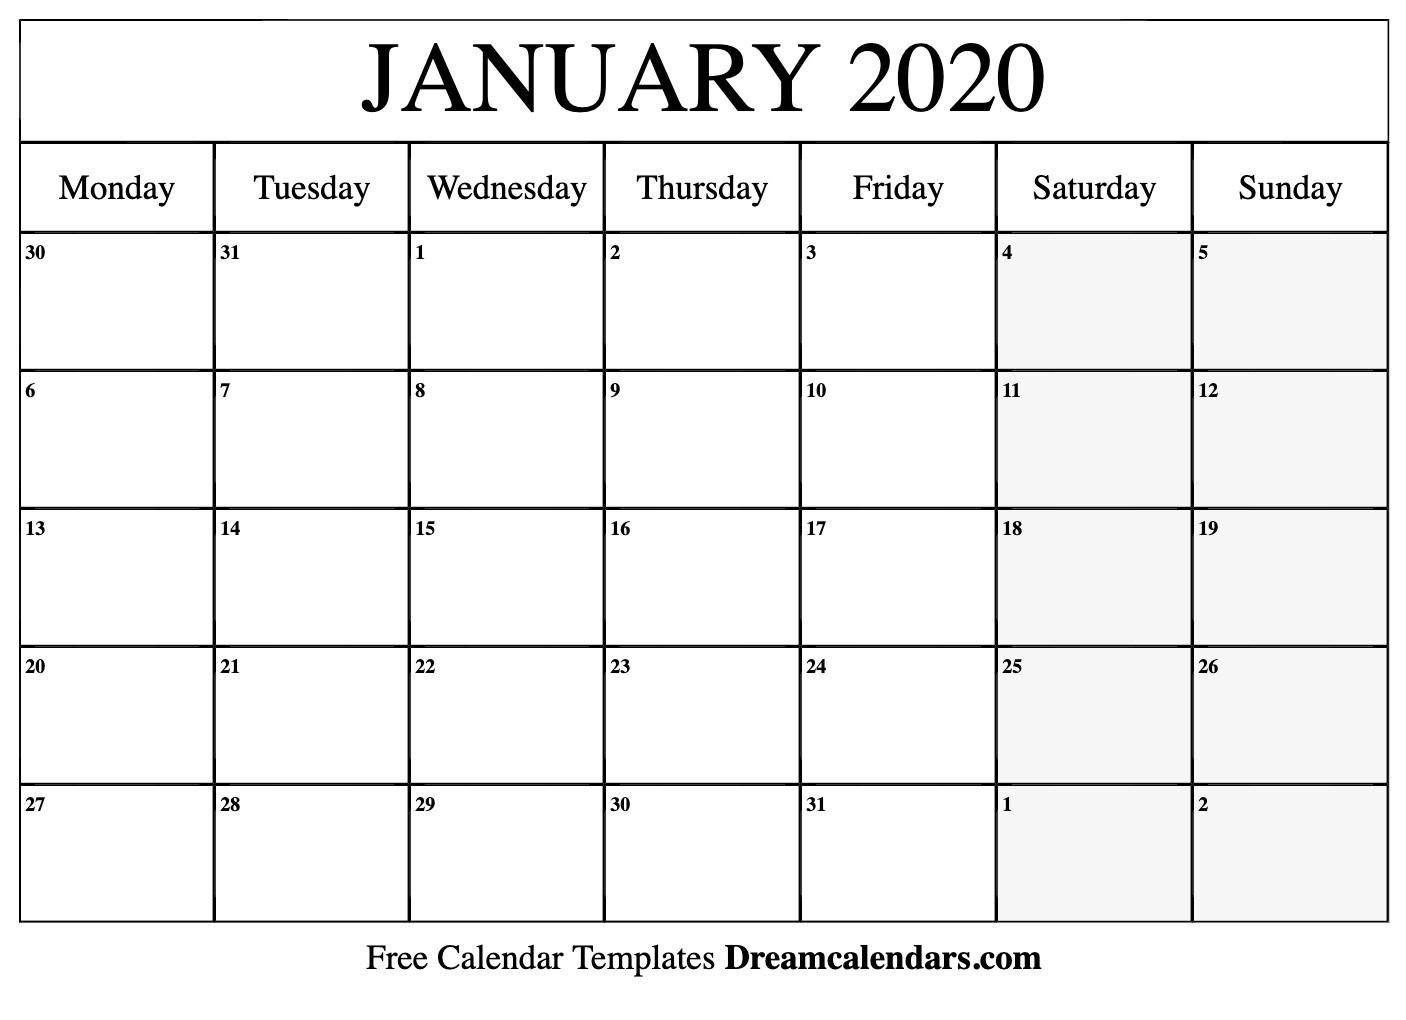 Printable January 2020 Calendar-January 2020 Calendar With Us Holidays